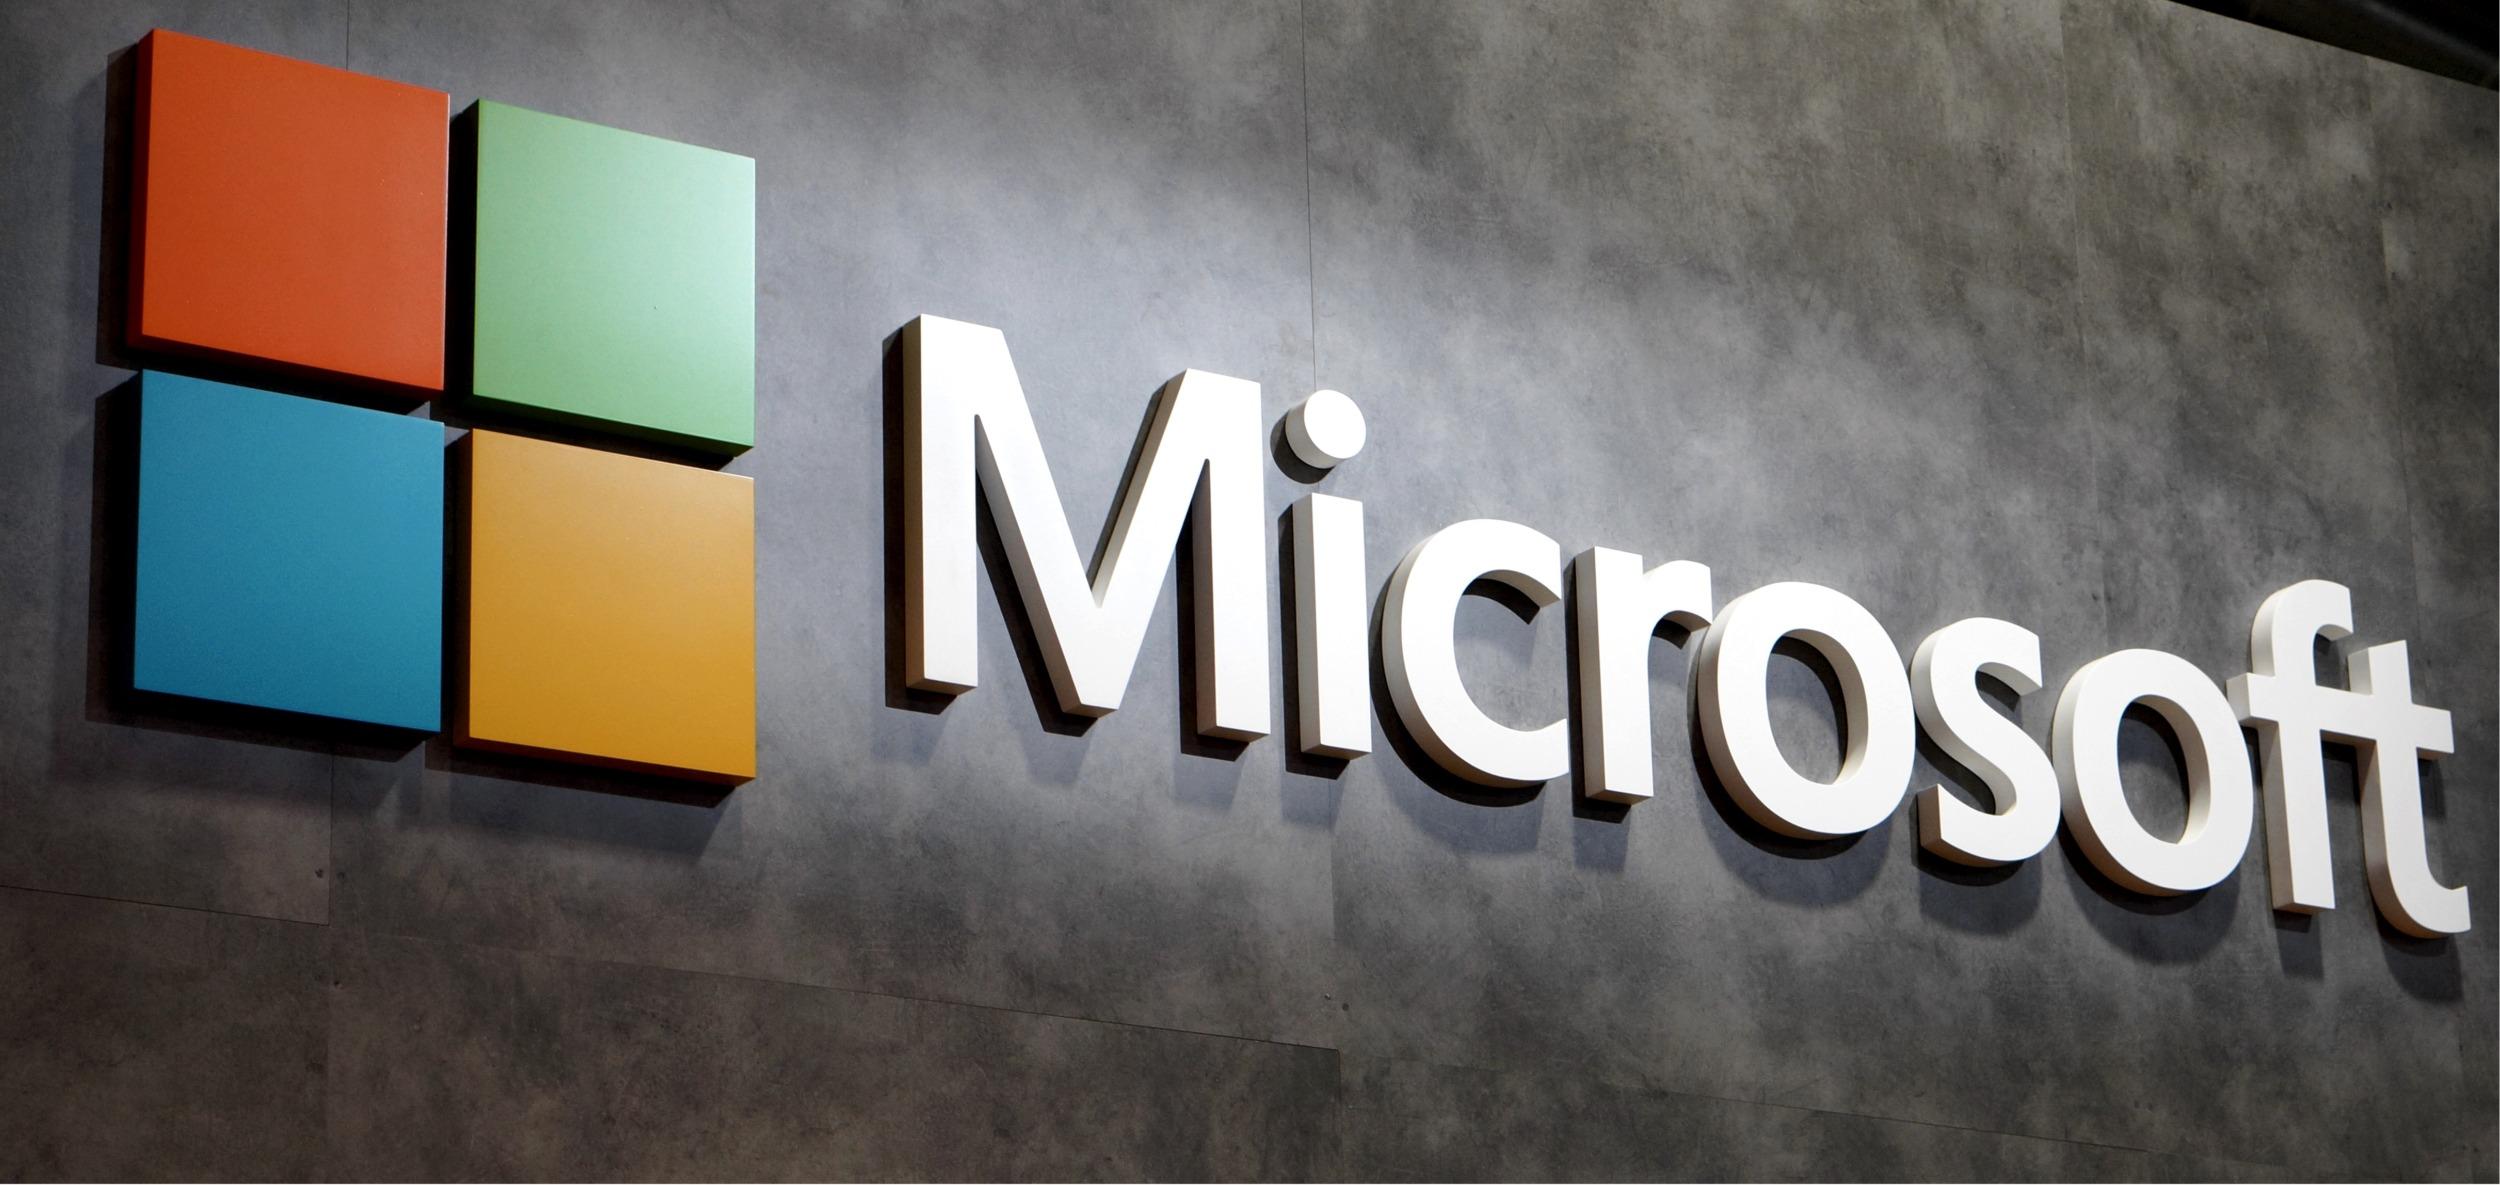 Microsoft uvolnil jednotnou aplikaci Office i pro iPady